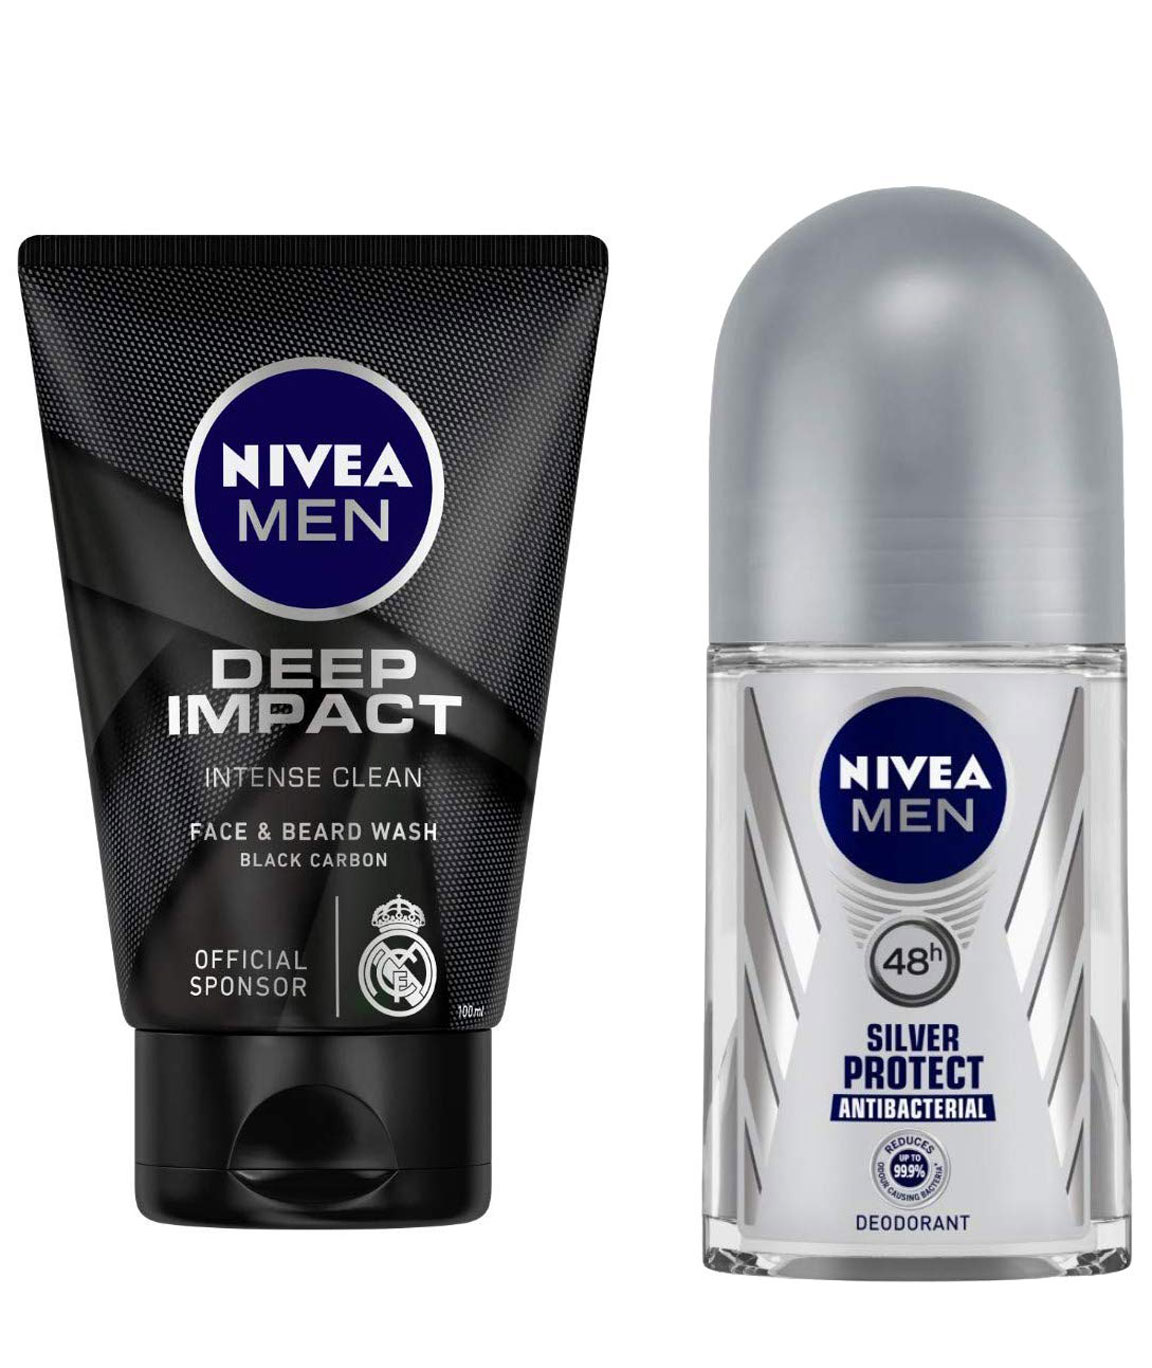 NIVEA MEN Face & Beard Wash, Deep Impact Intense Clean, 100ml and NIVEA MEN, Deodorant Roll-on, Silver Protect Antibacterial, 50ml